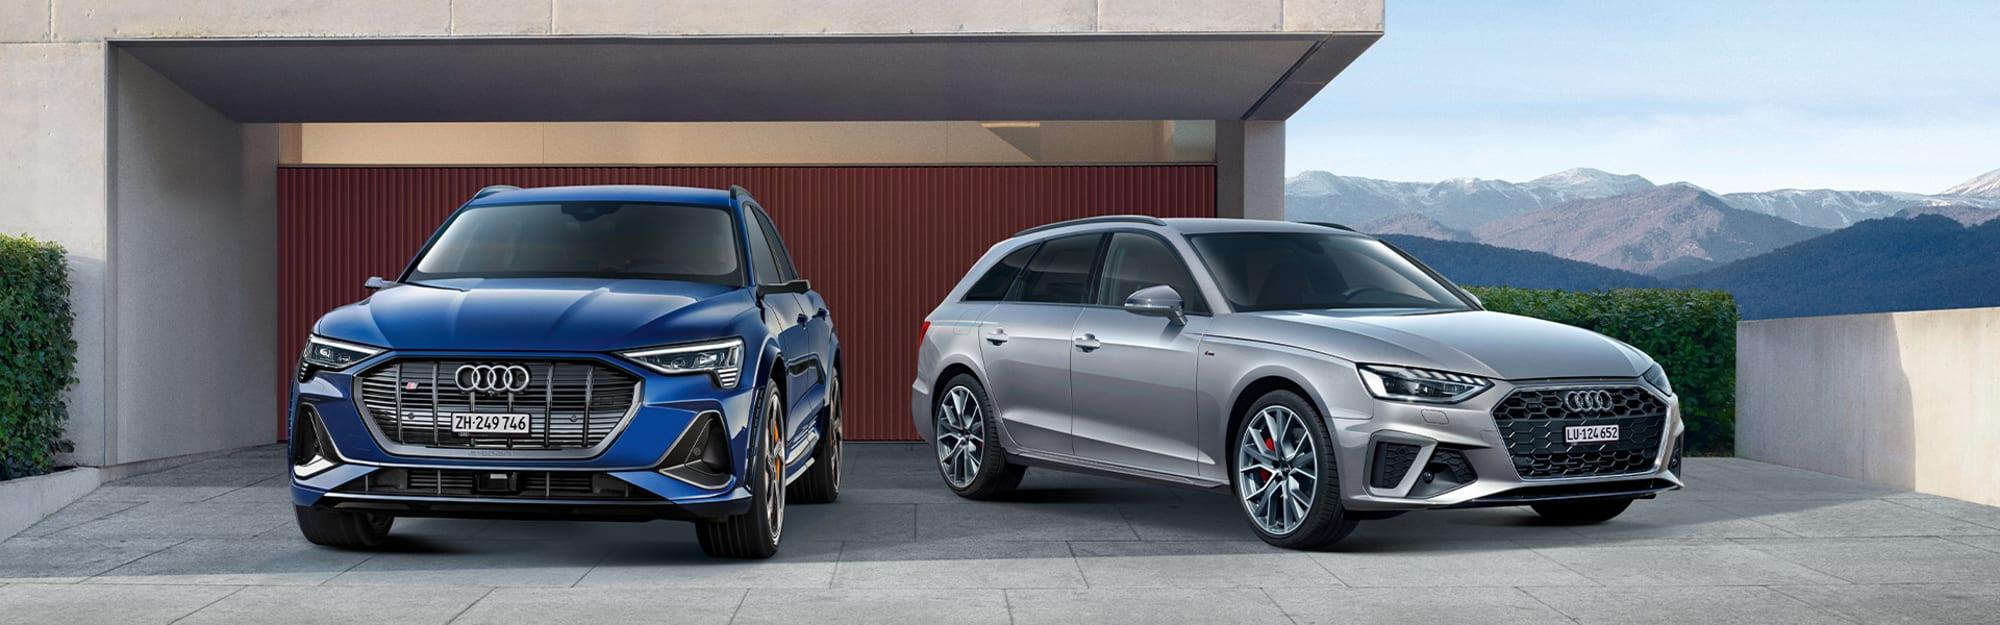 Audi_etronS_A4_VKF_Range_1920x600px_d